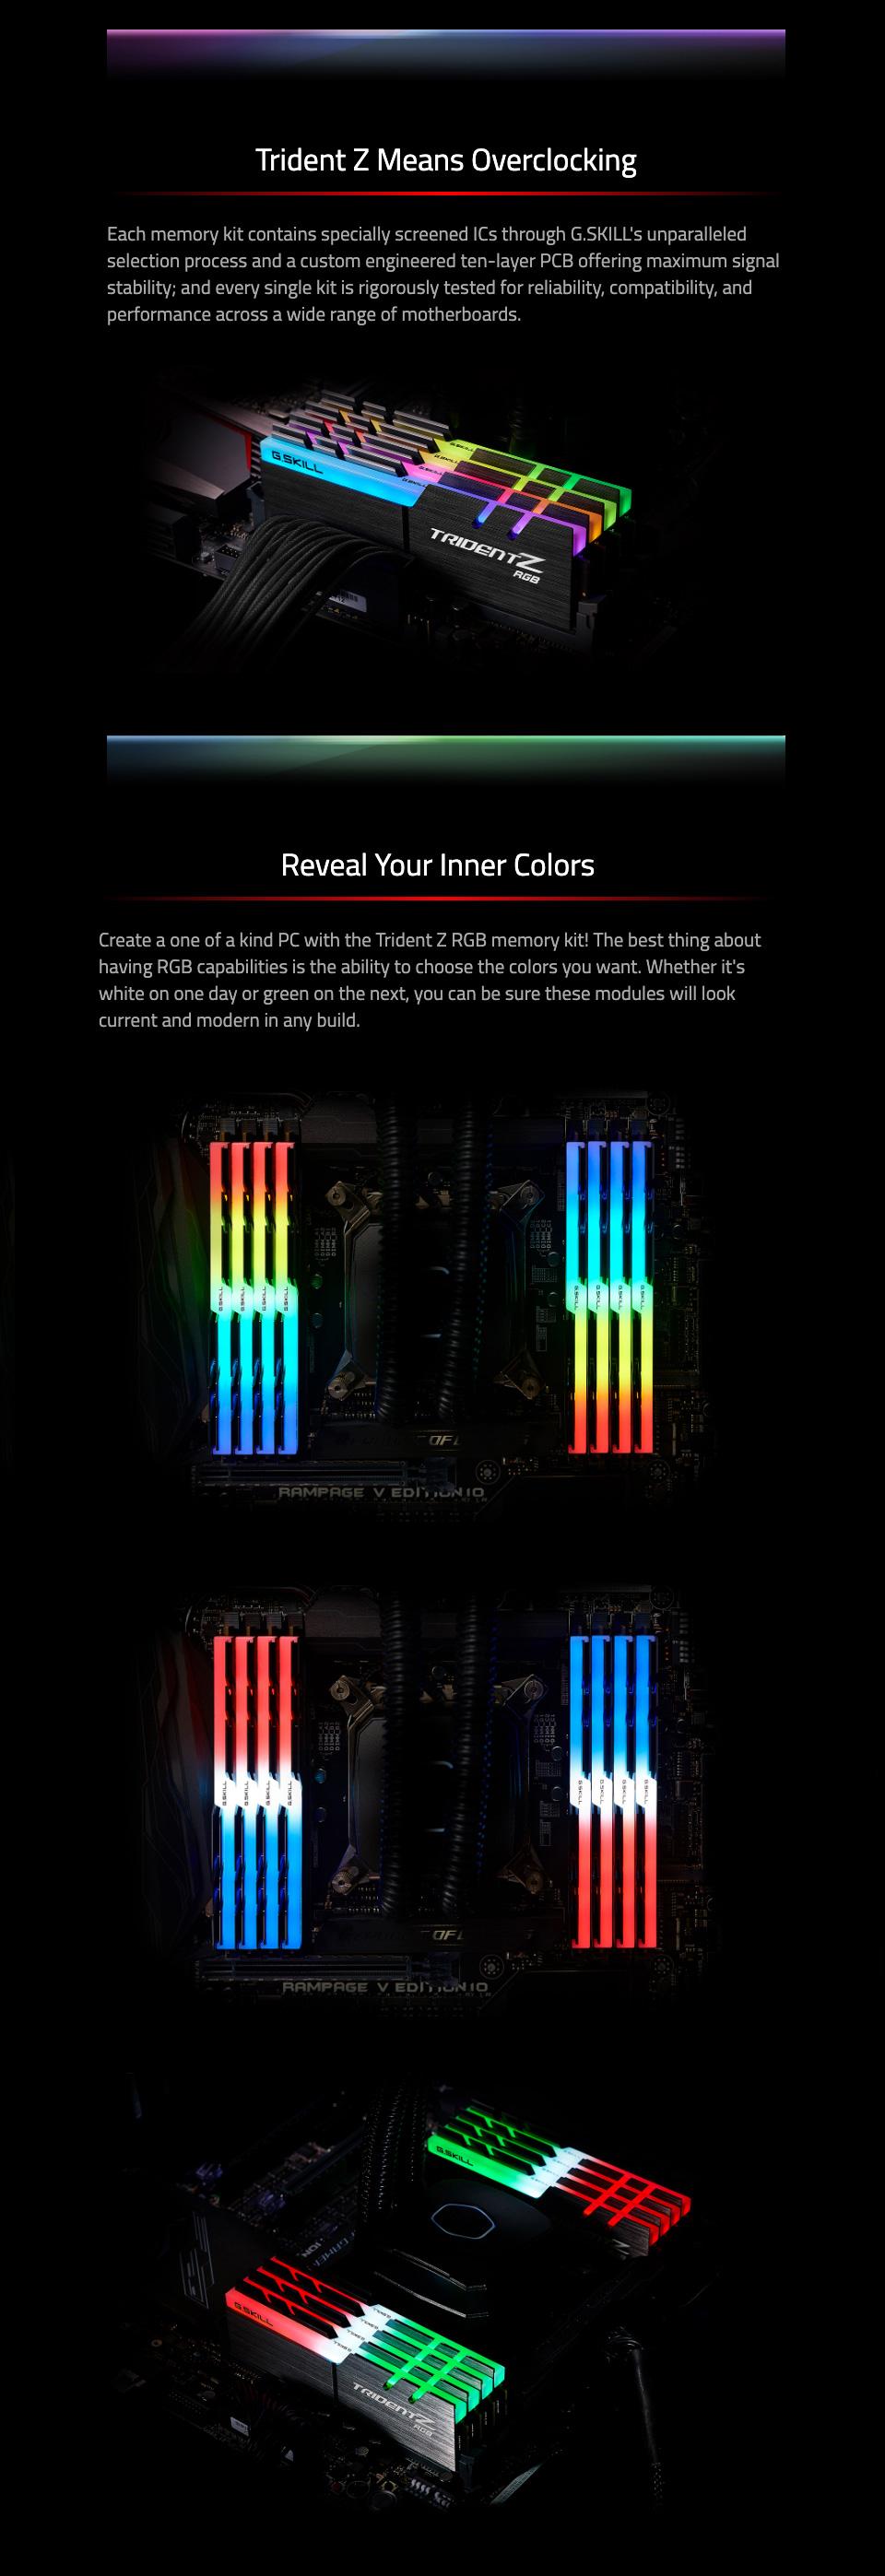 G.Skill Trident Z RGB F4-3600C18Q-64GTZR 64GB (4x16GB) DDR4 features 2